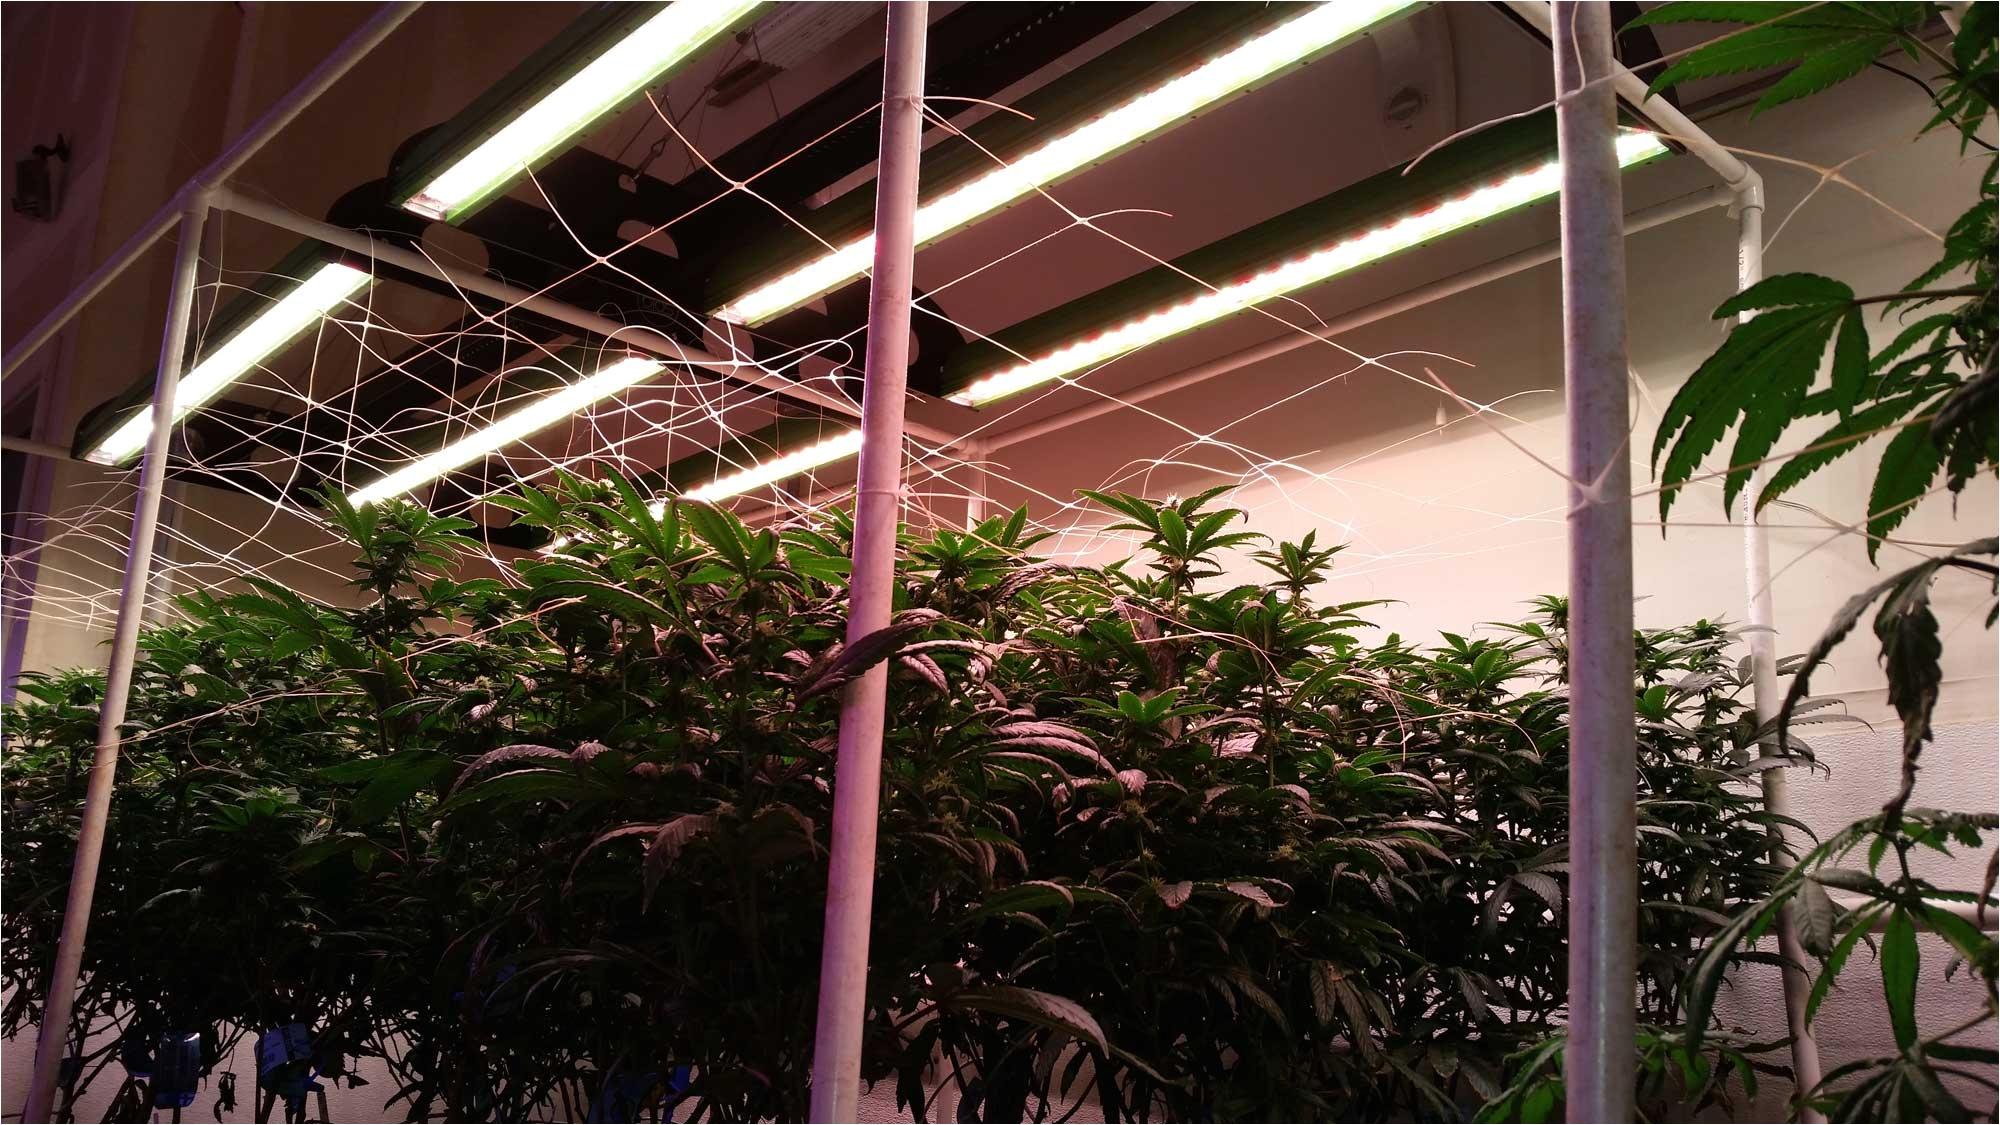 bios for cannabis growers